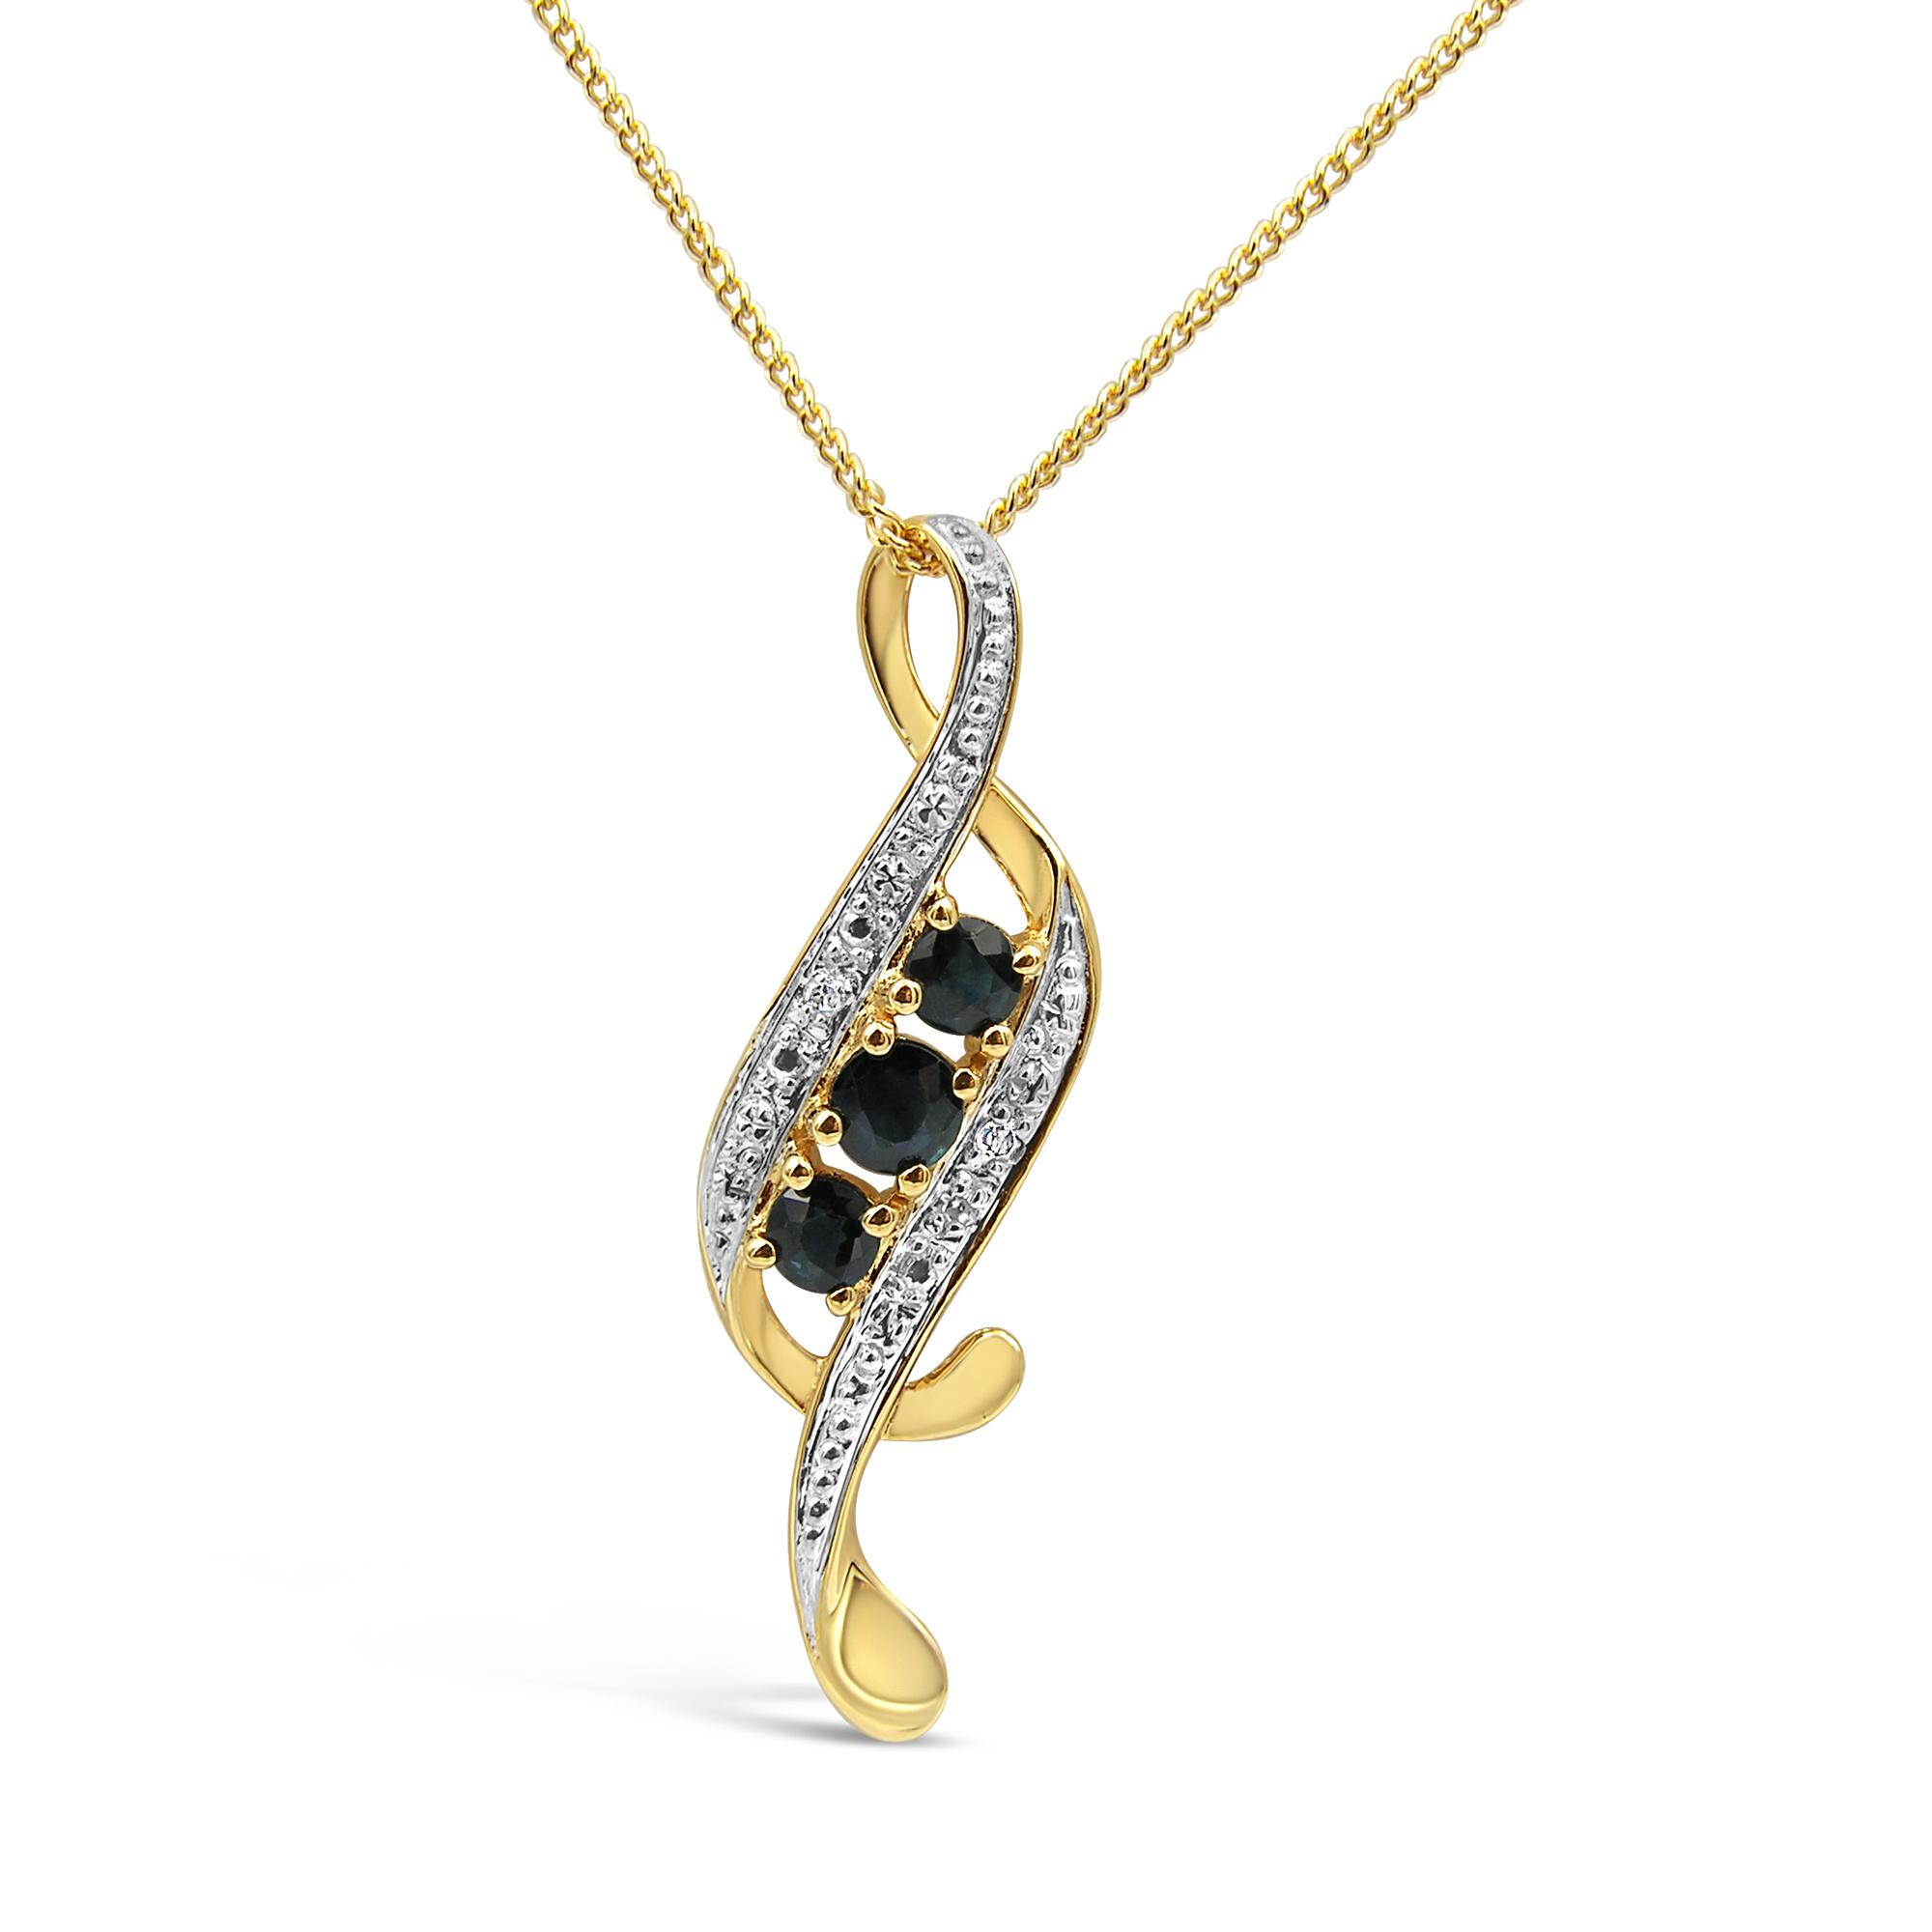 18 karat yellow & white gold pendant with 0.02 ct diamonds & 0.33 ct sapphire